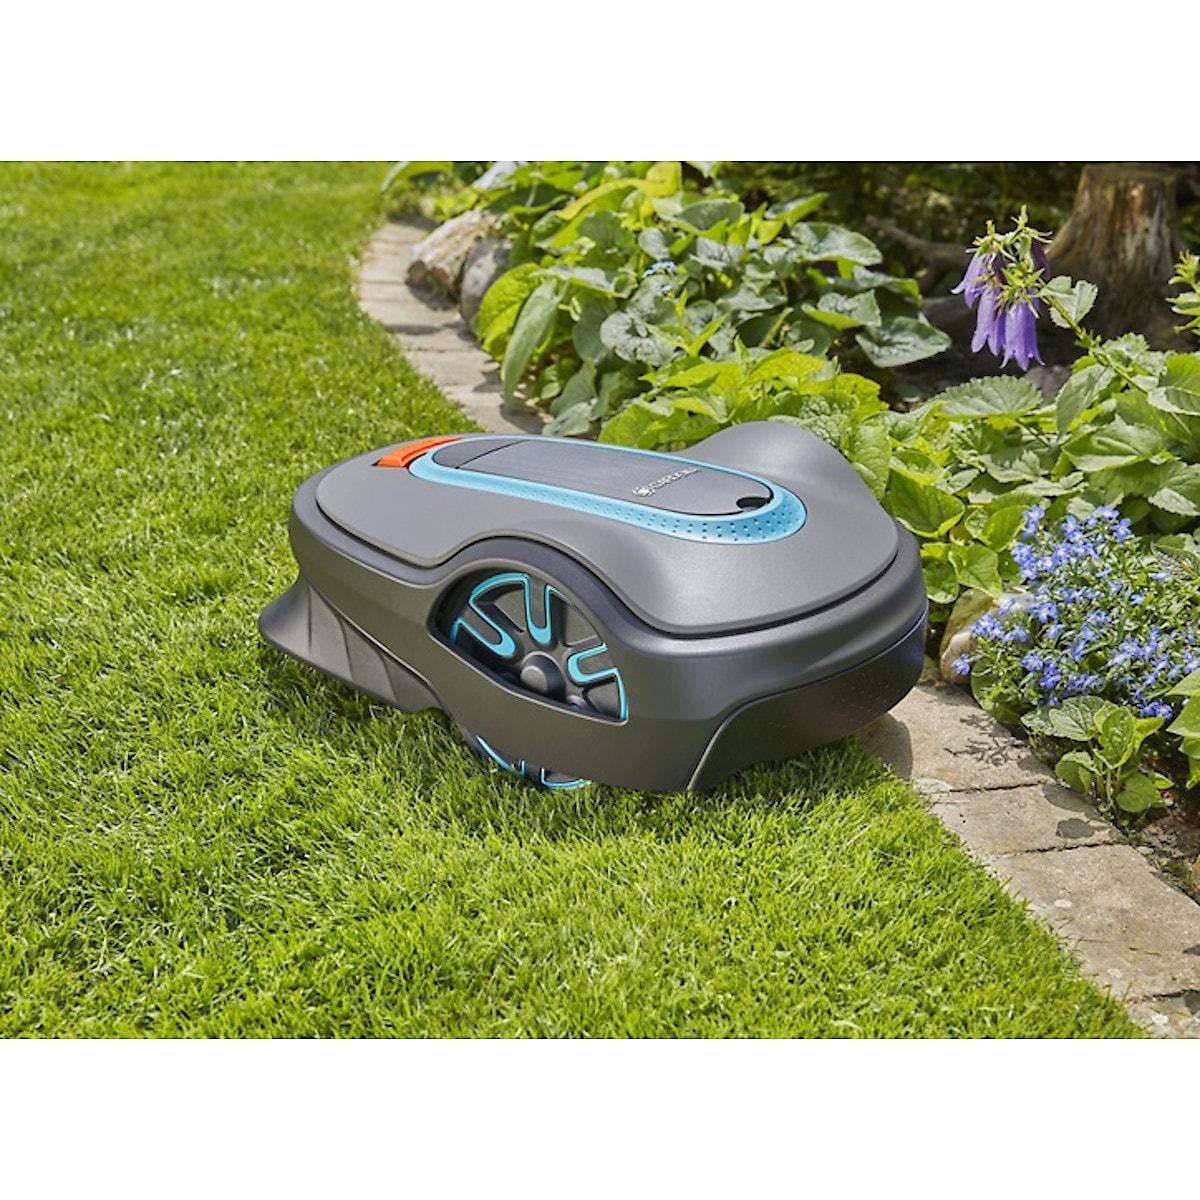 Gardena Sileno Life 1000, robotgressklipper